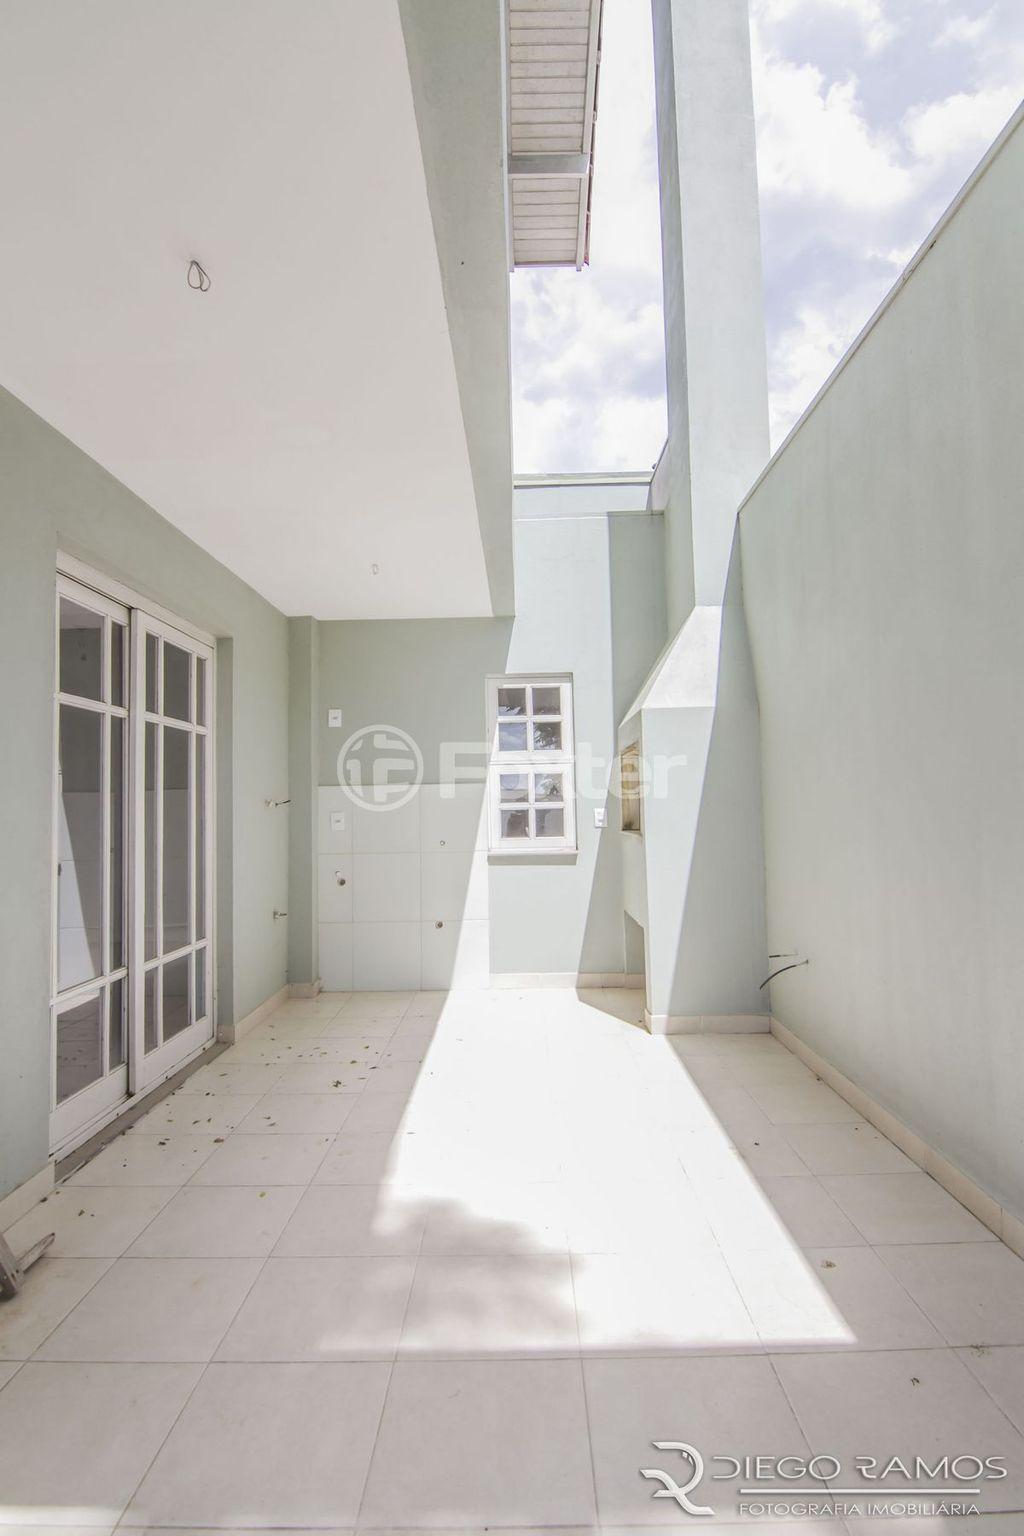 Casa 2 Dorm, Aberta dos Morros, Porto Alegre (118259) - Foto 15